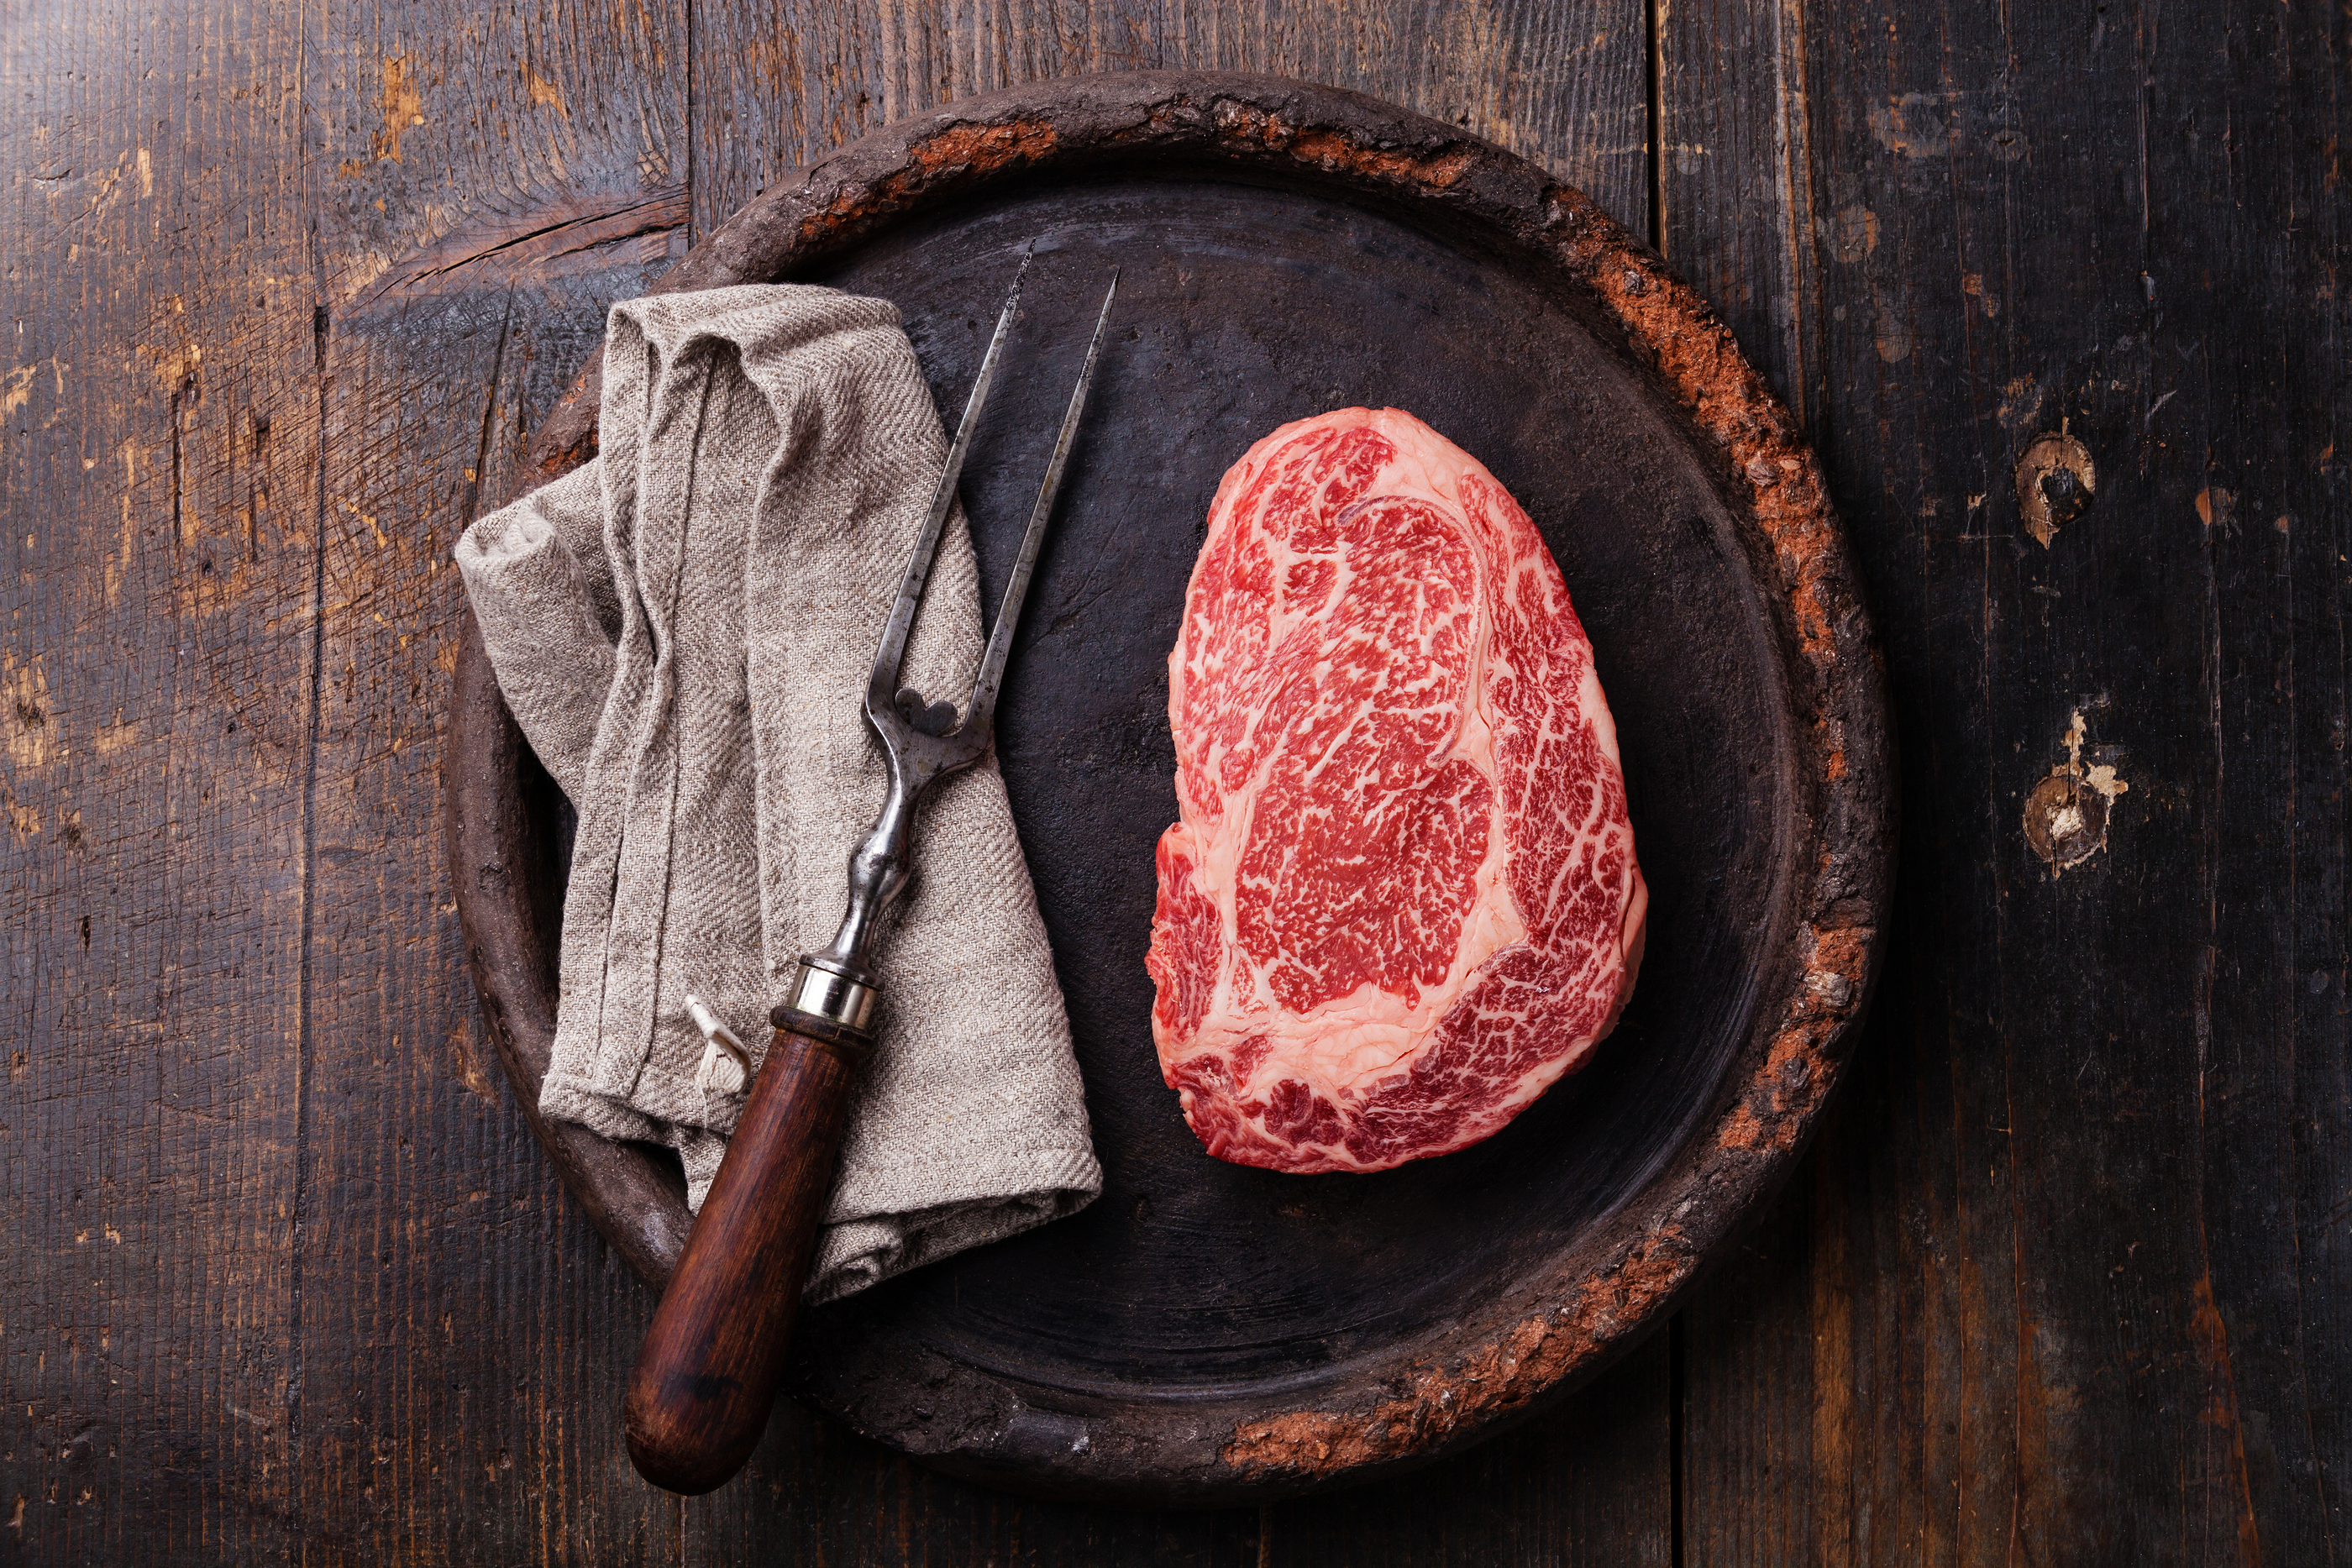 Raw Fresh Marbled Meat Black Angus Steak Ribeye And Meat Fork On Dark Background